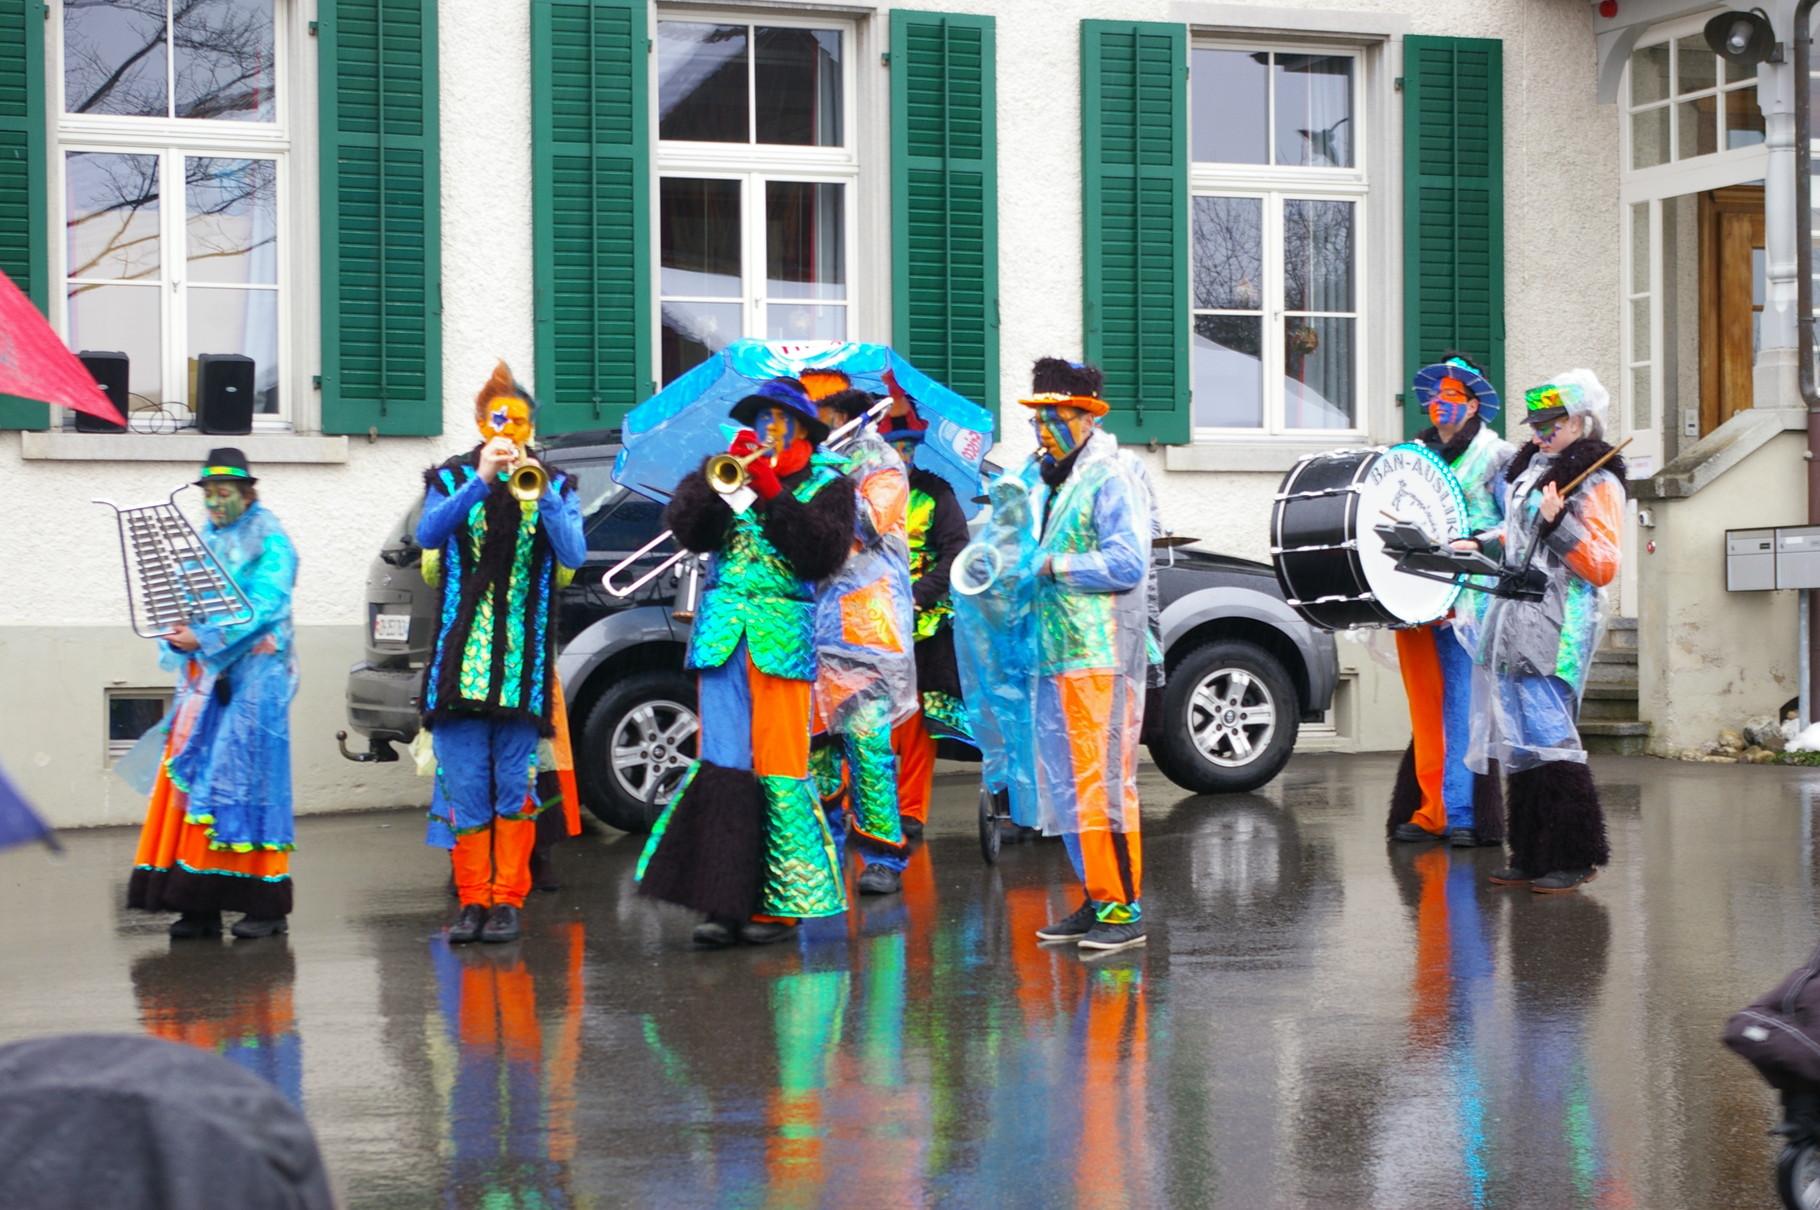 Die Banausliker trotzen dem Regen